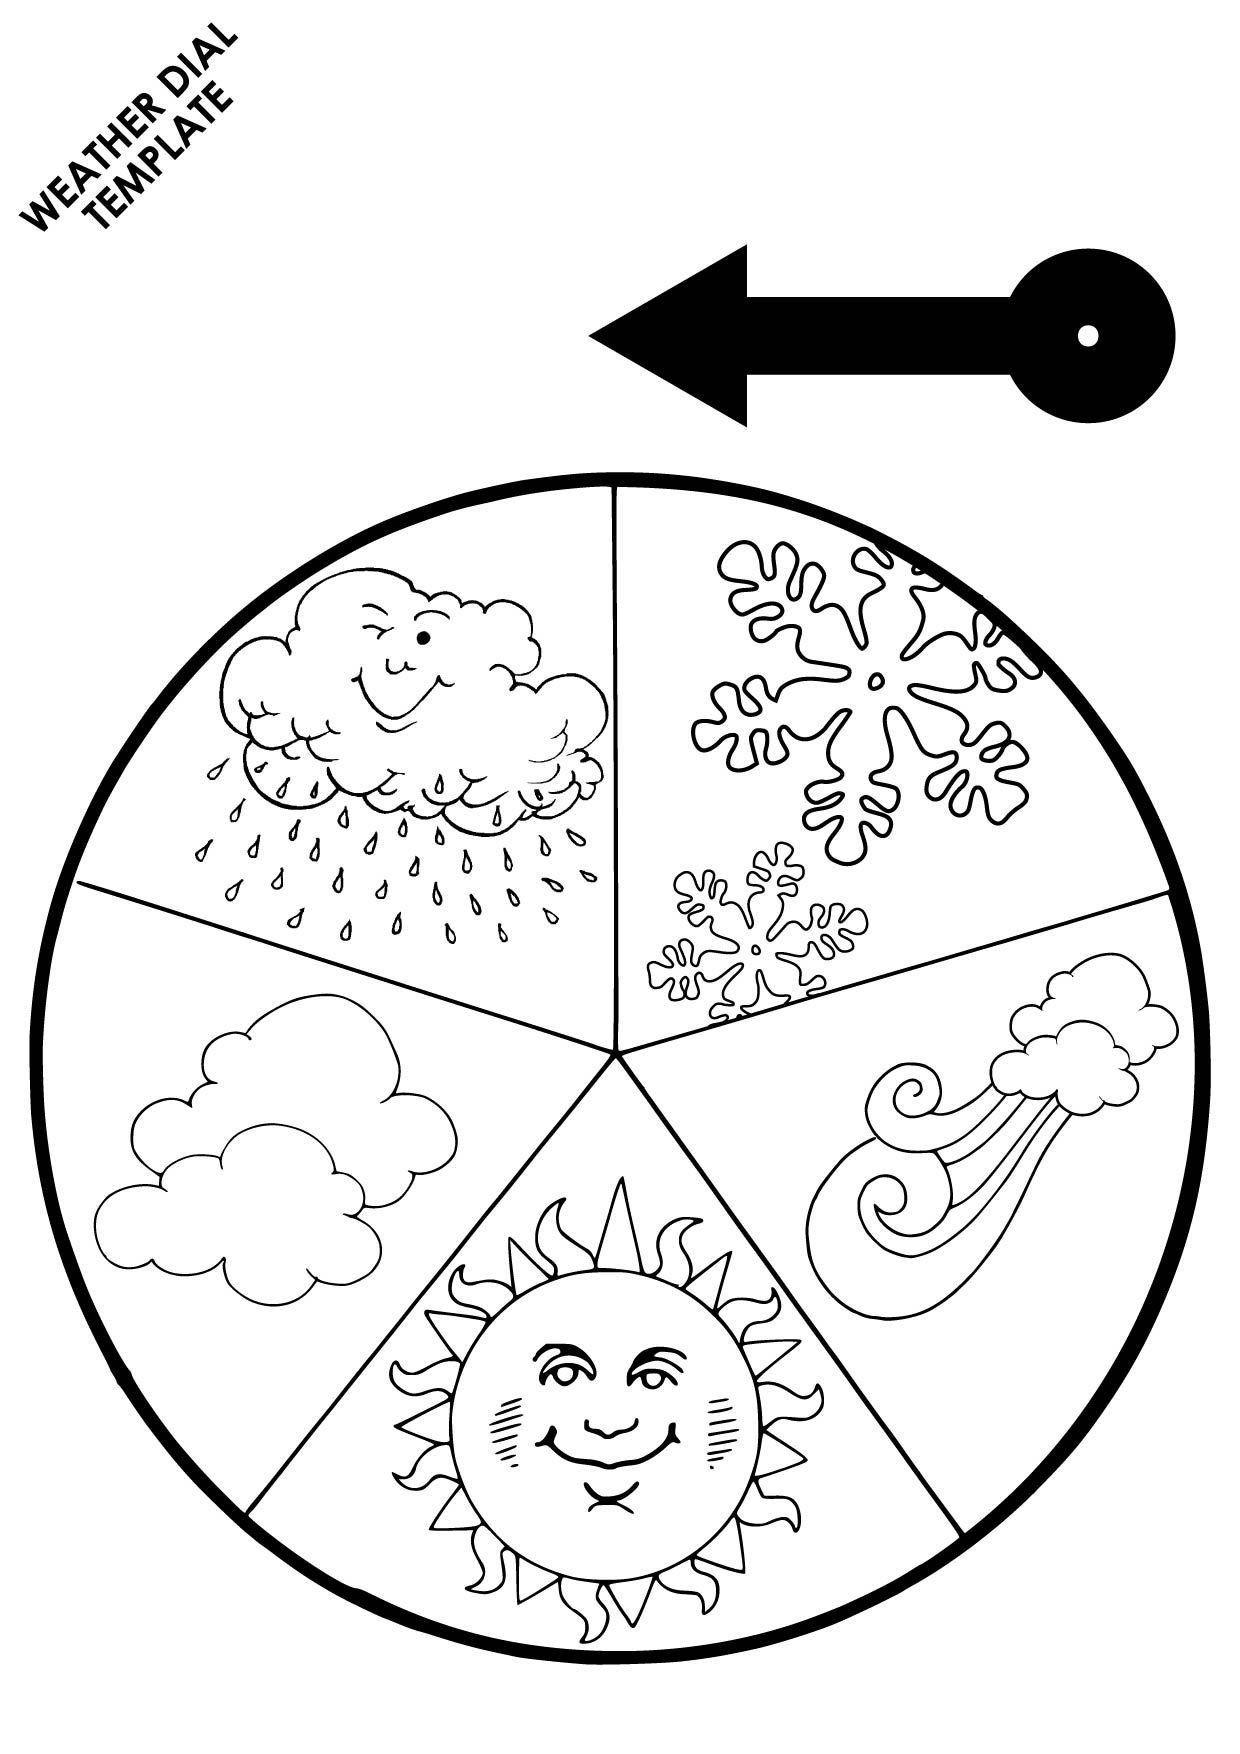 Weather Worksheet For Kindergarten Earth Weather Worksheet For Kids Printable Worksheets And Weather Worksheets Preschool Weather Coloring Pages